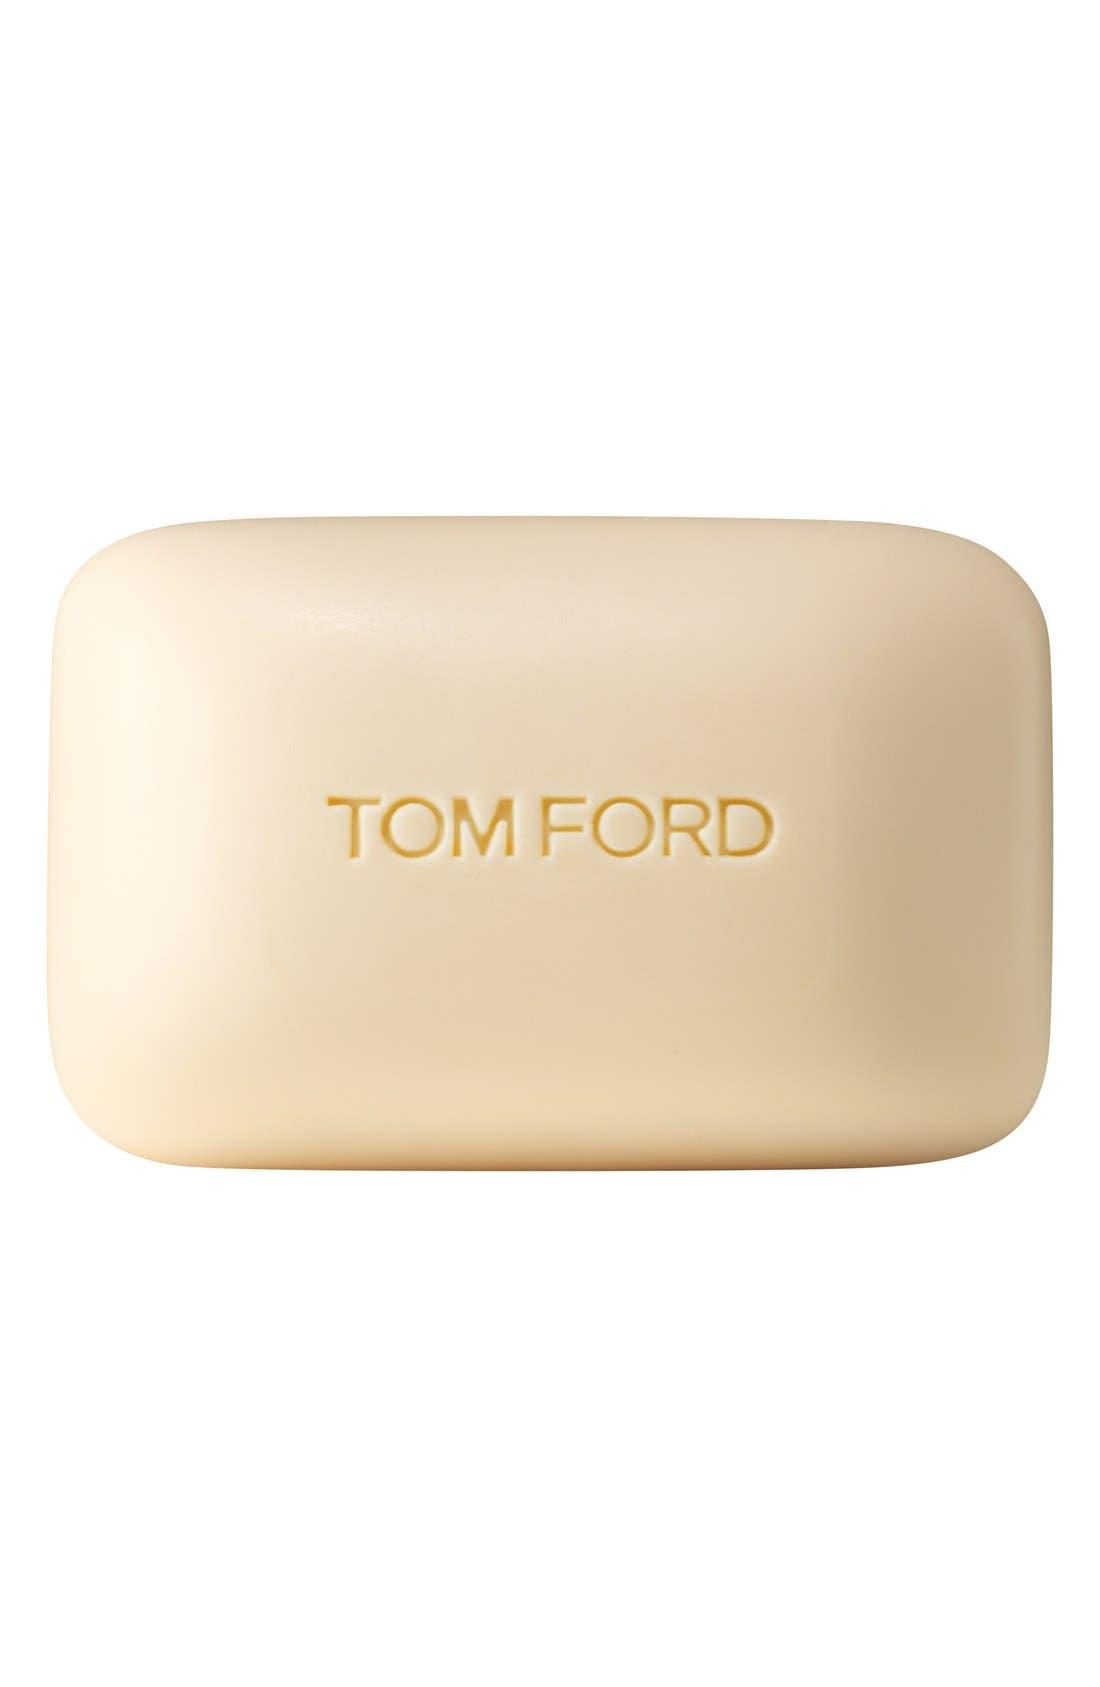 Tom Ford 'Jasmin Rouge' Bath Soap